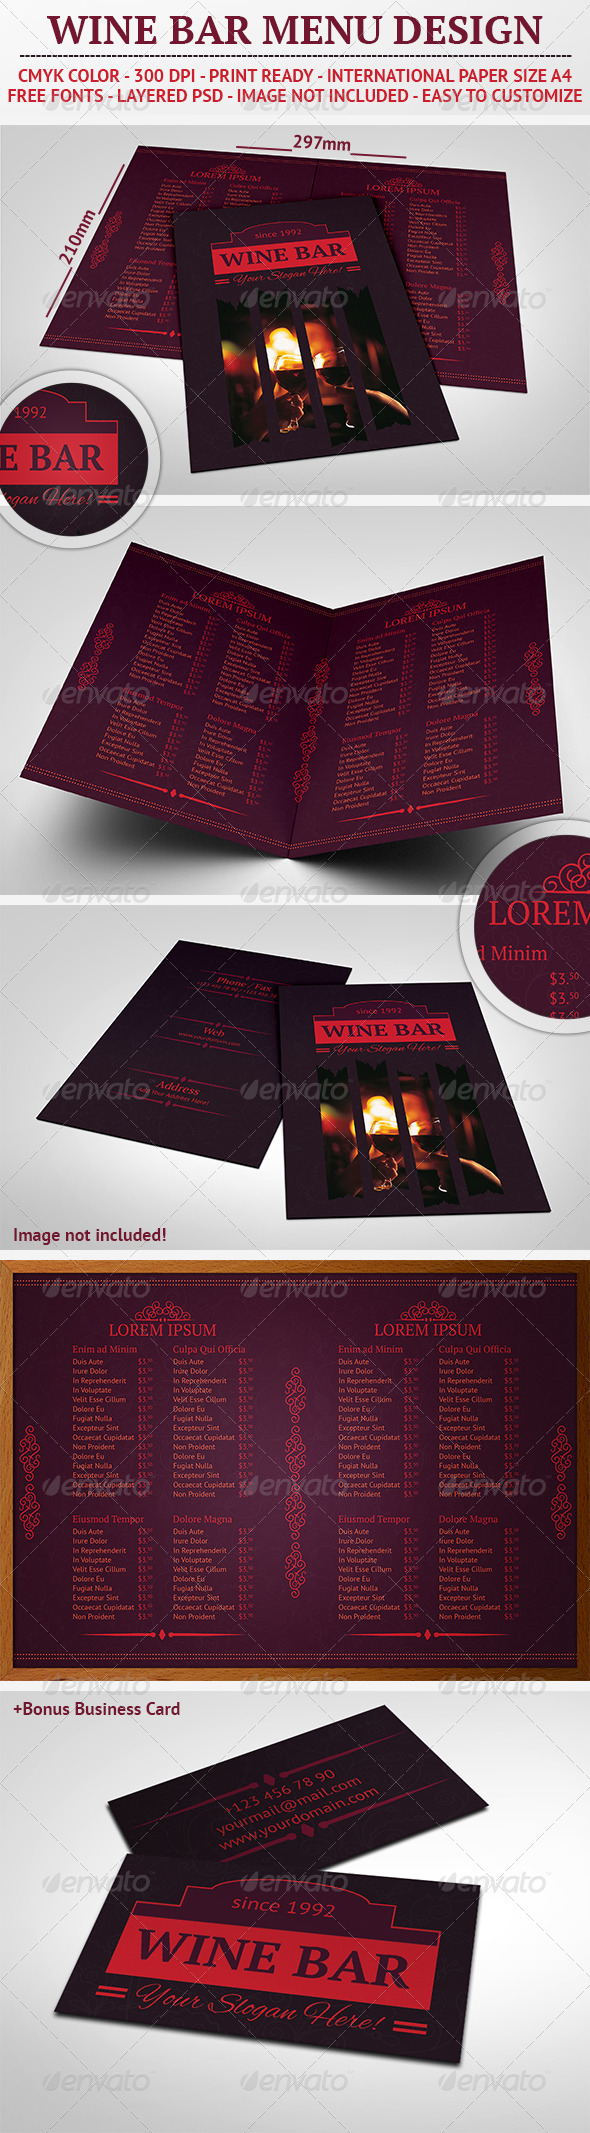 GraphicRiver Wine Bar Menu Design 5108026